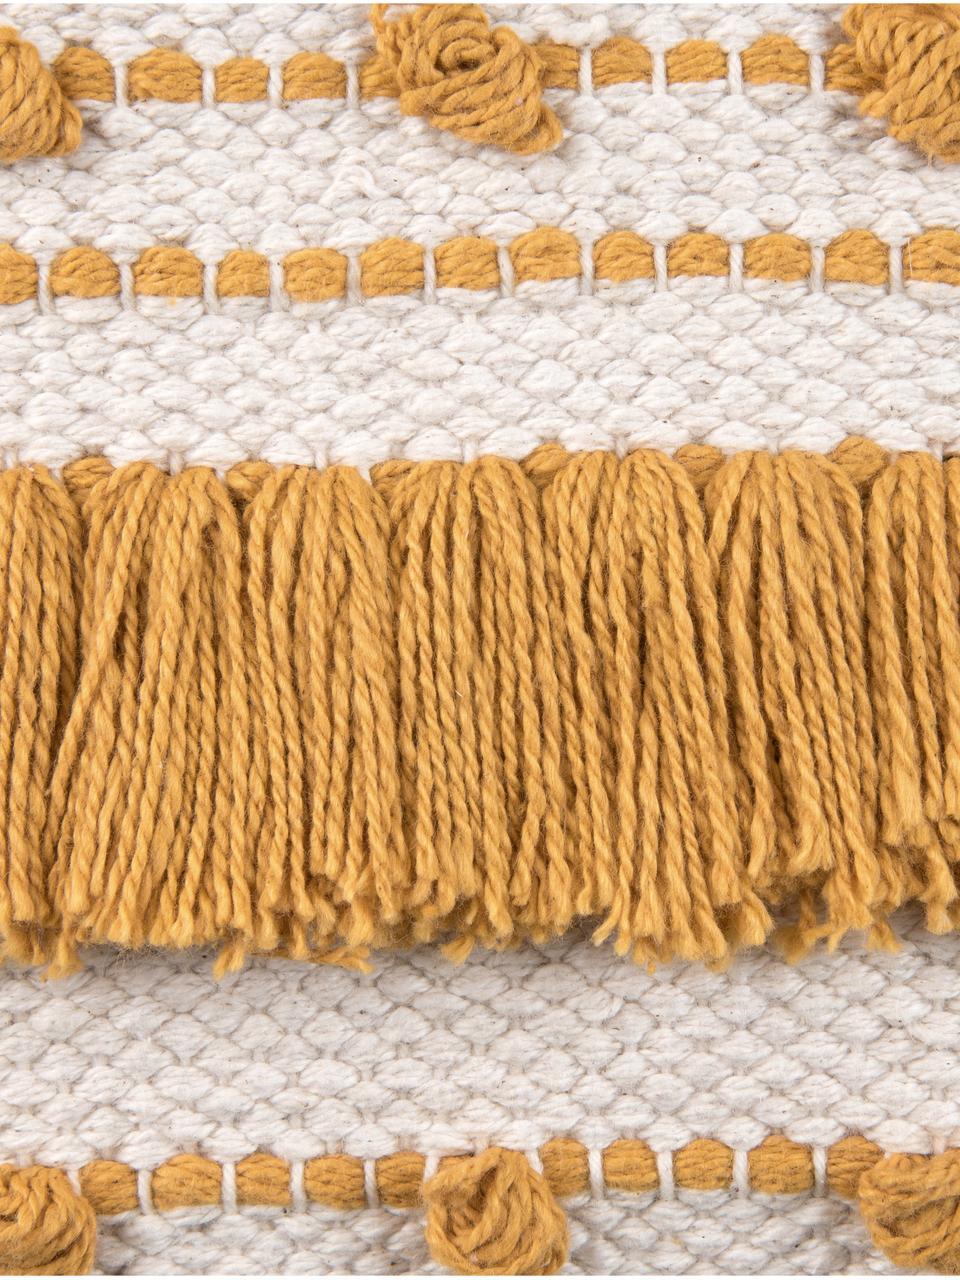 Boho kussenhoes Kaheka in ecru met franjes, 100% katoen, Geel, ecru, 45 x 45 cm